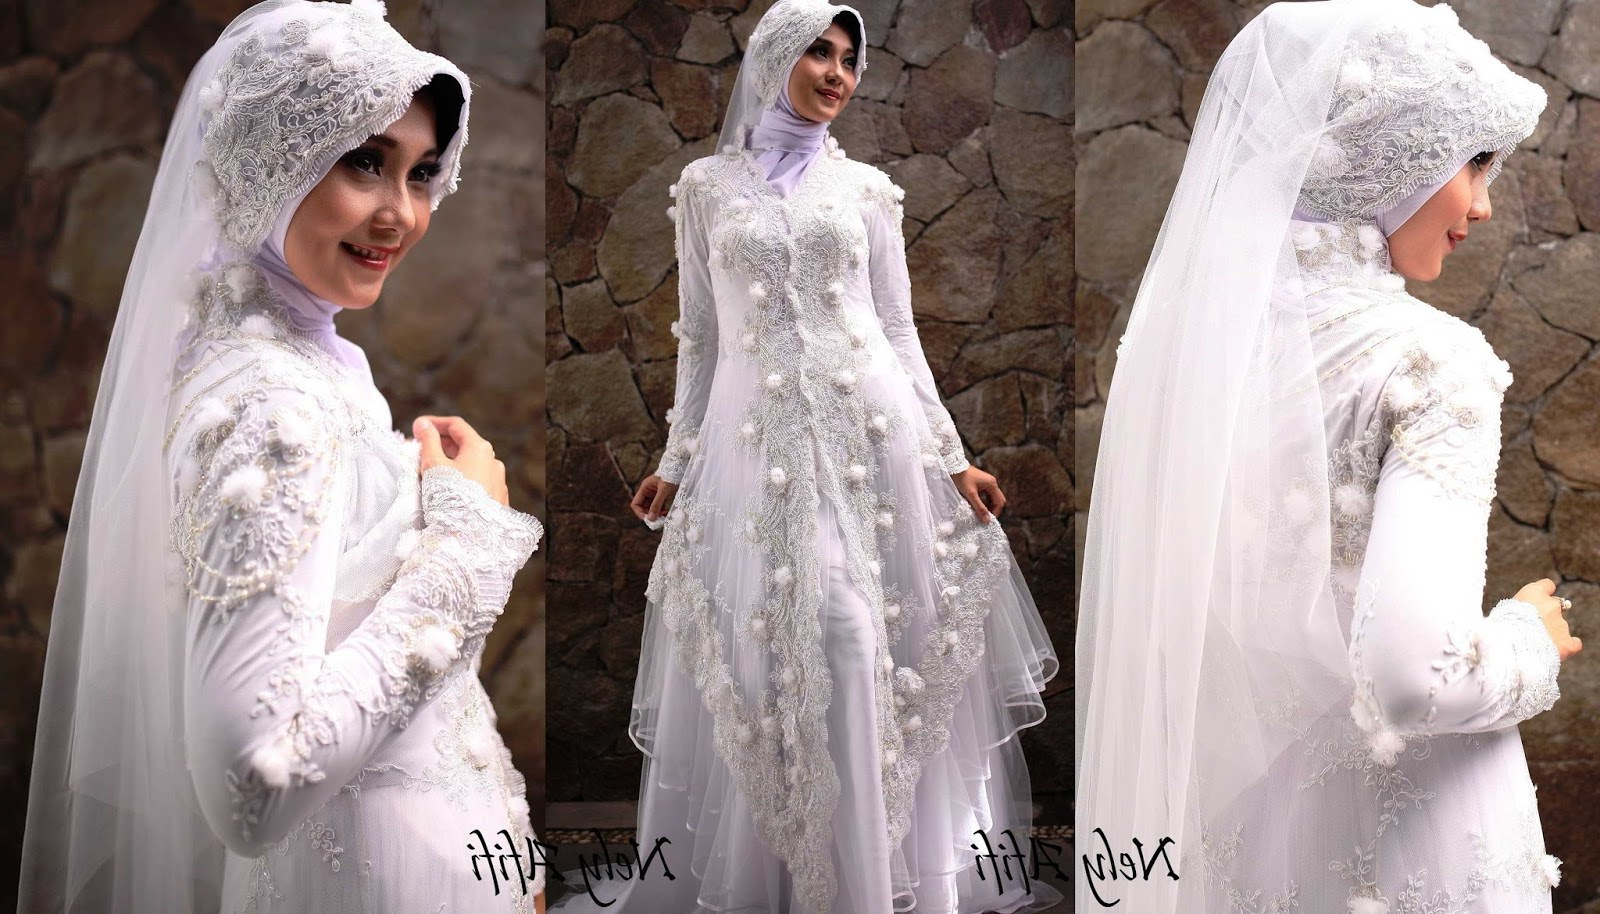 Inspirasi Inspirasi Gaun Pengantin Muslimah Nkde 43 Inspirasi Terpopuler Baju Pengantin Muslim Sederhana Putih